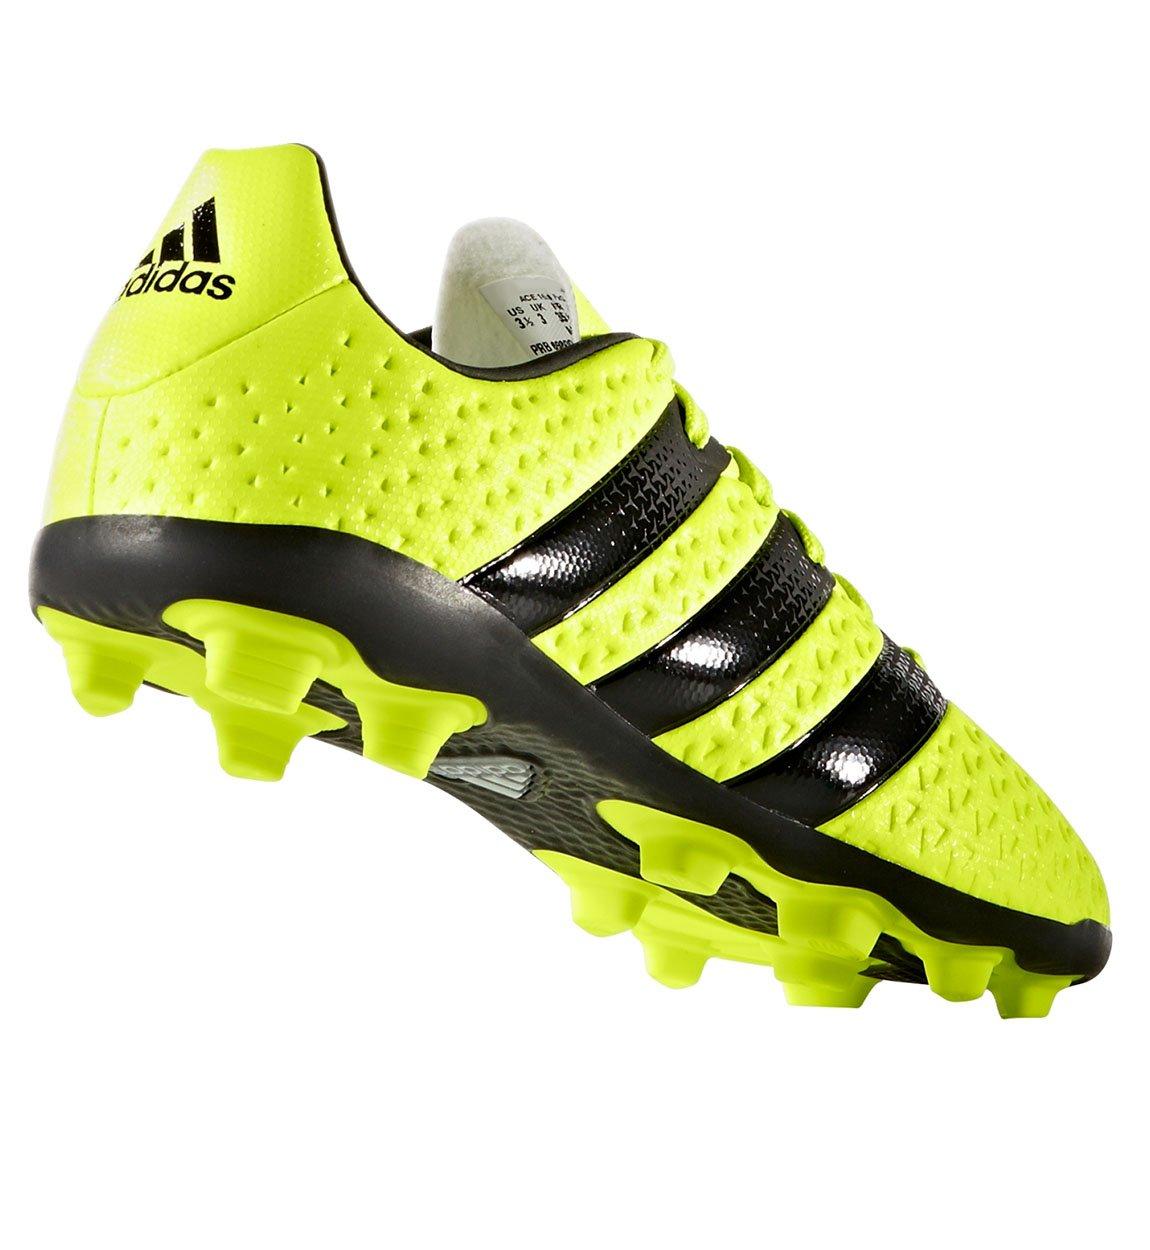 06382ce9ac7f Galleon - Adidas Performance Boys  Ace 164 Fxg J Skate Shoe